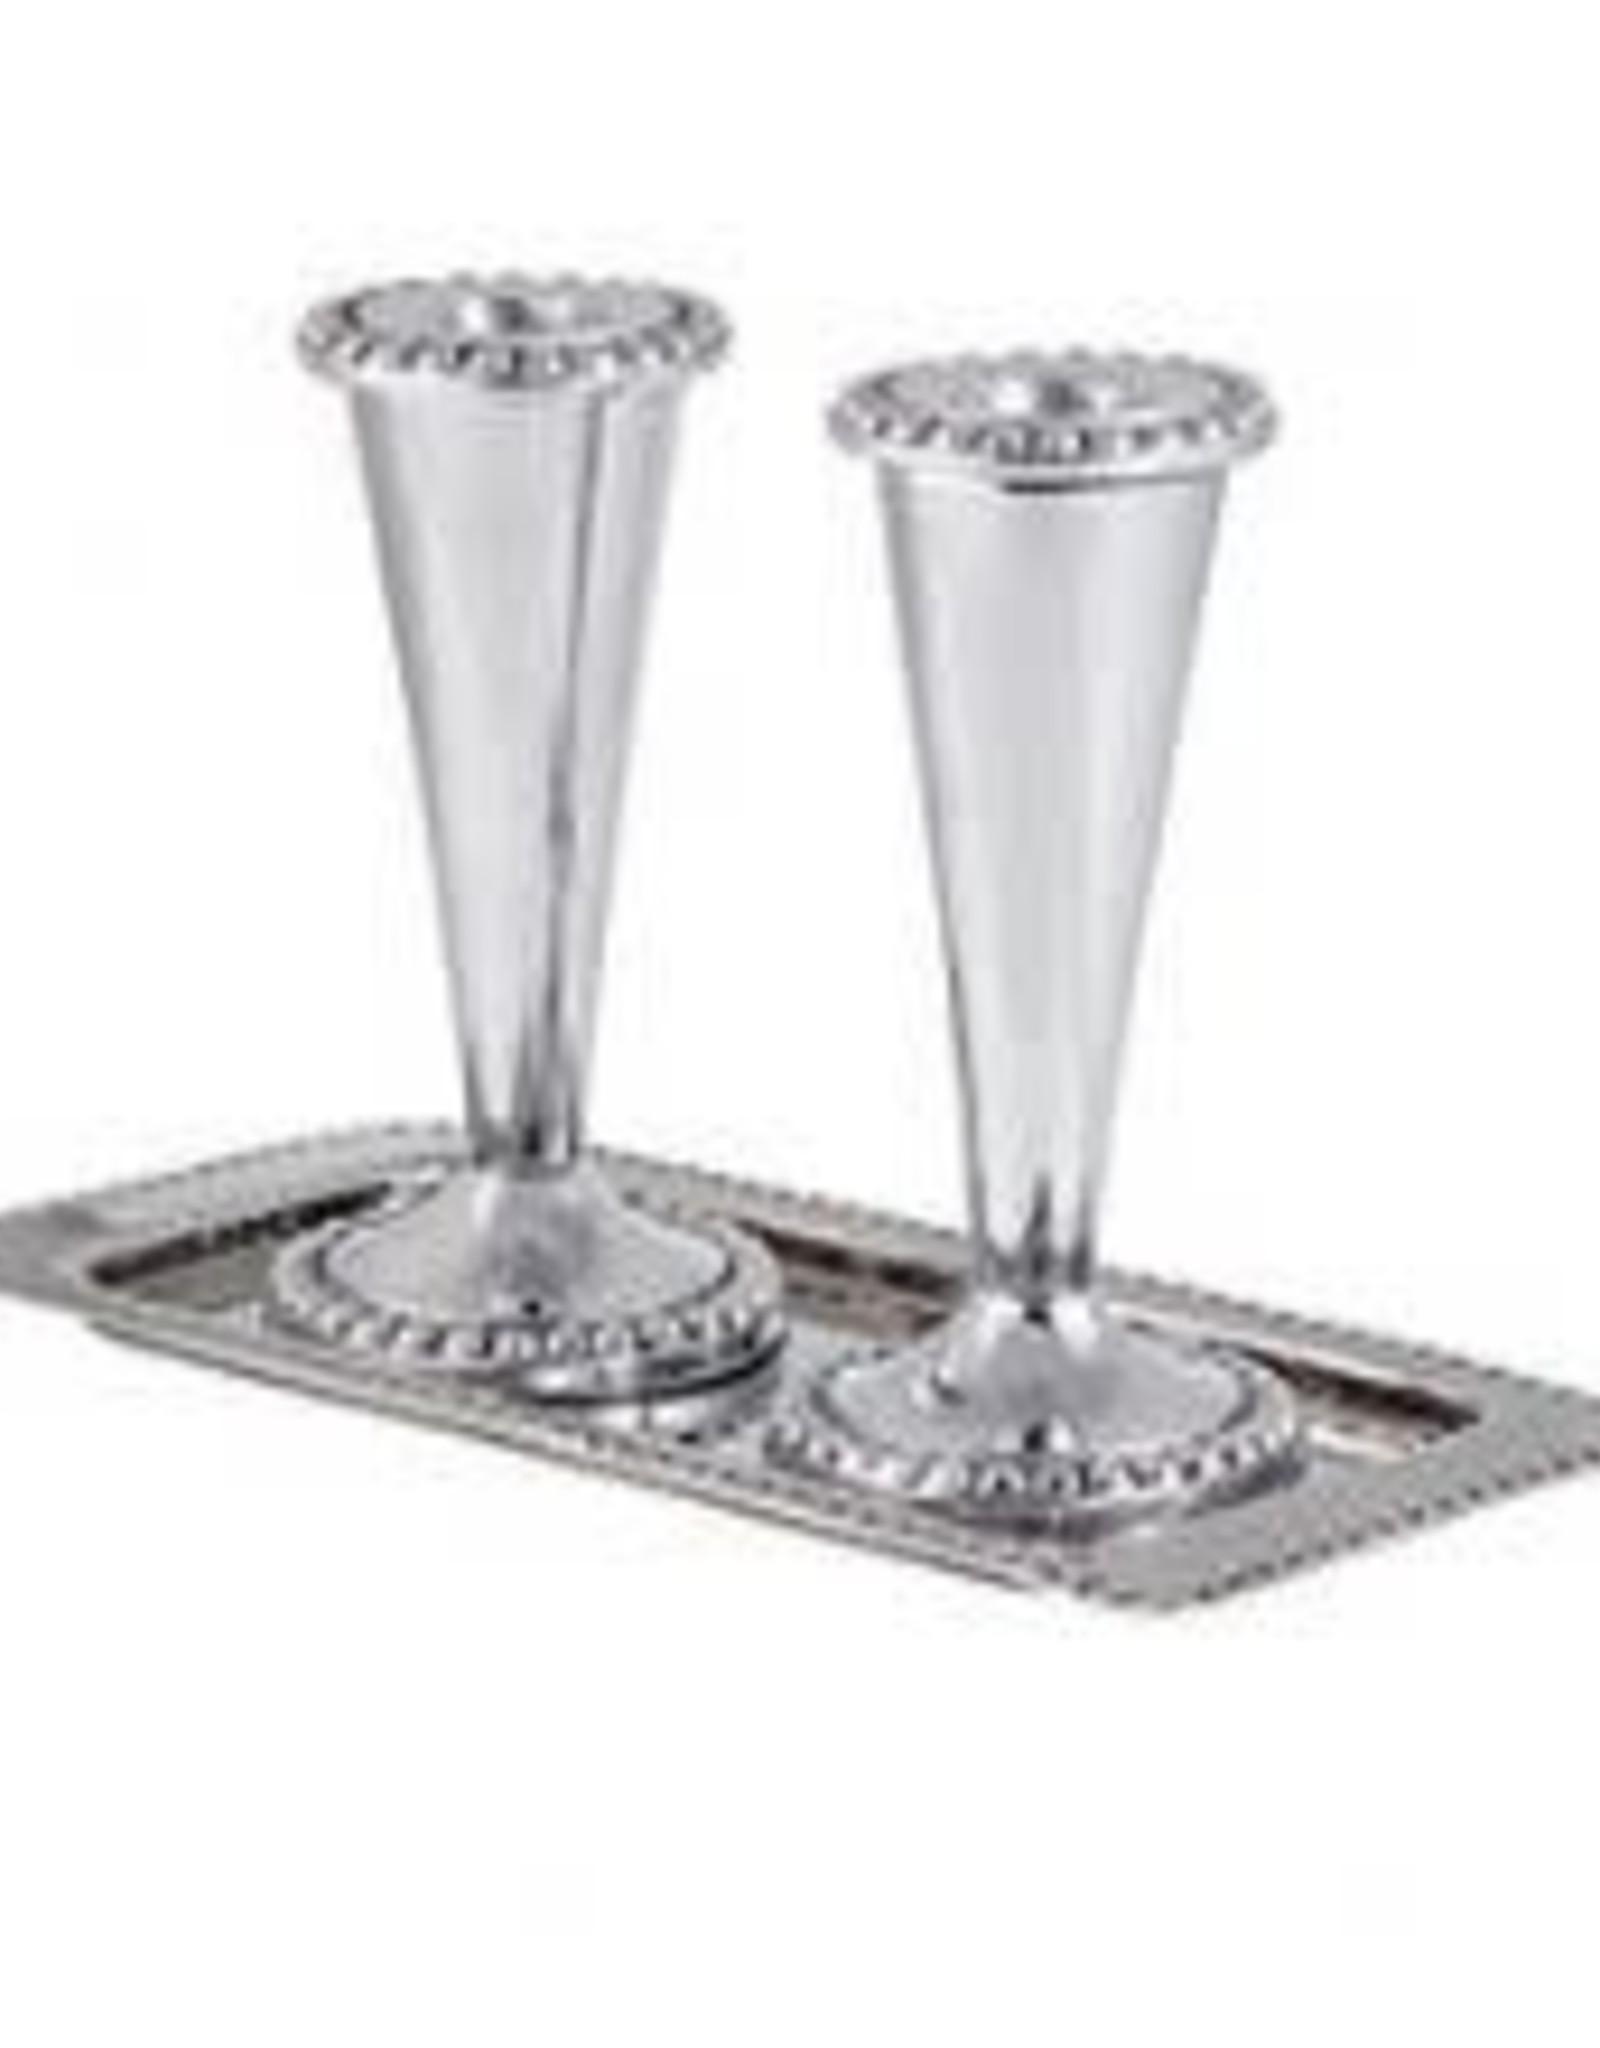 Candlesticks & tray set, 3pc